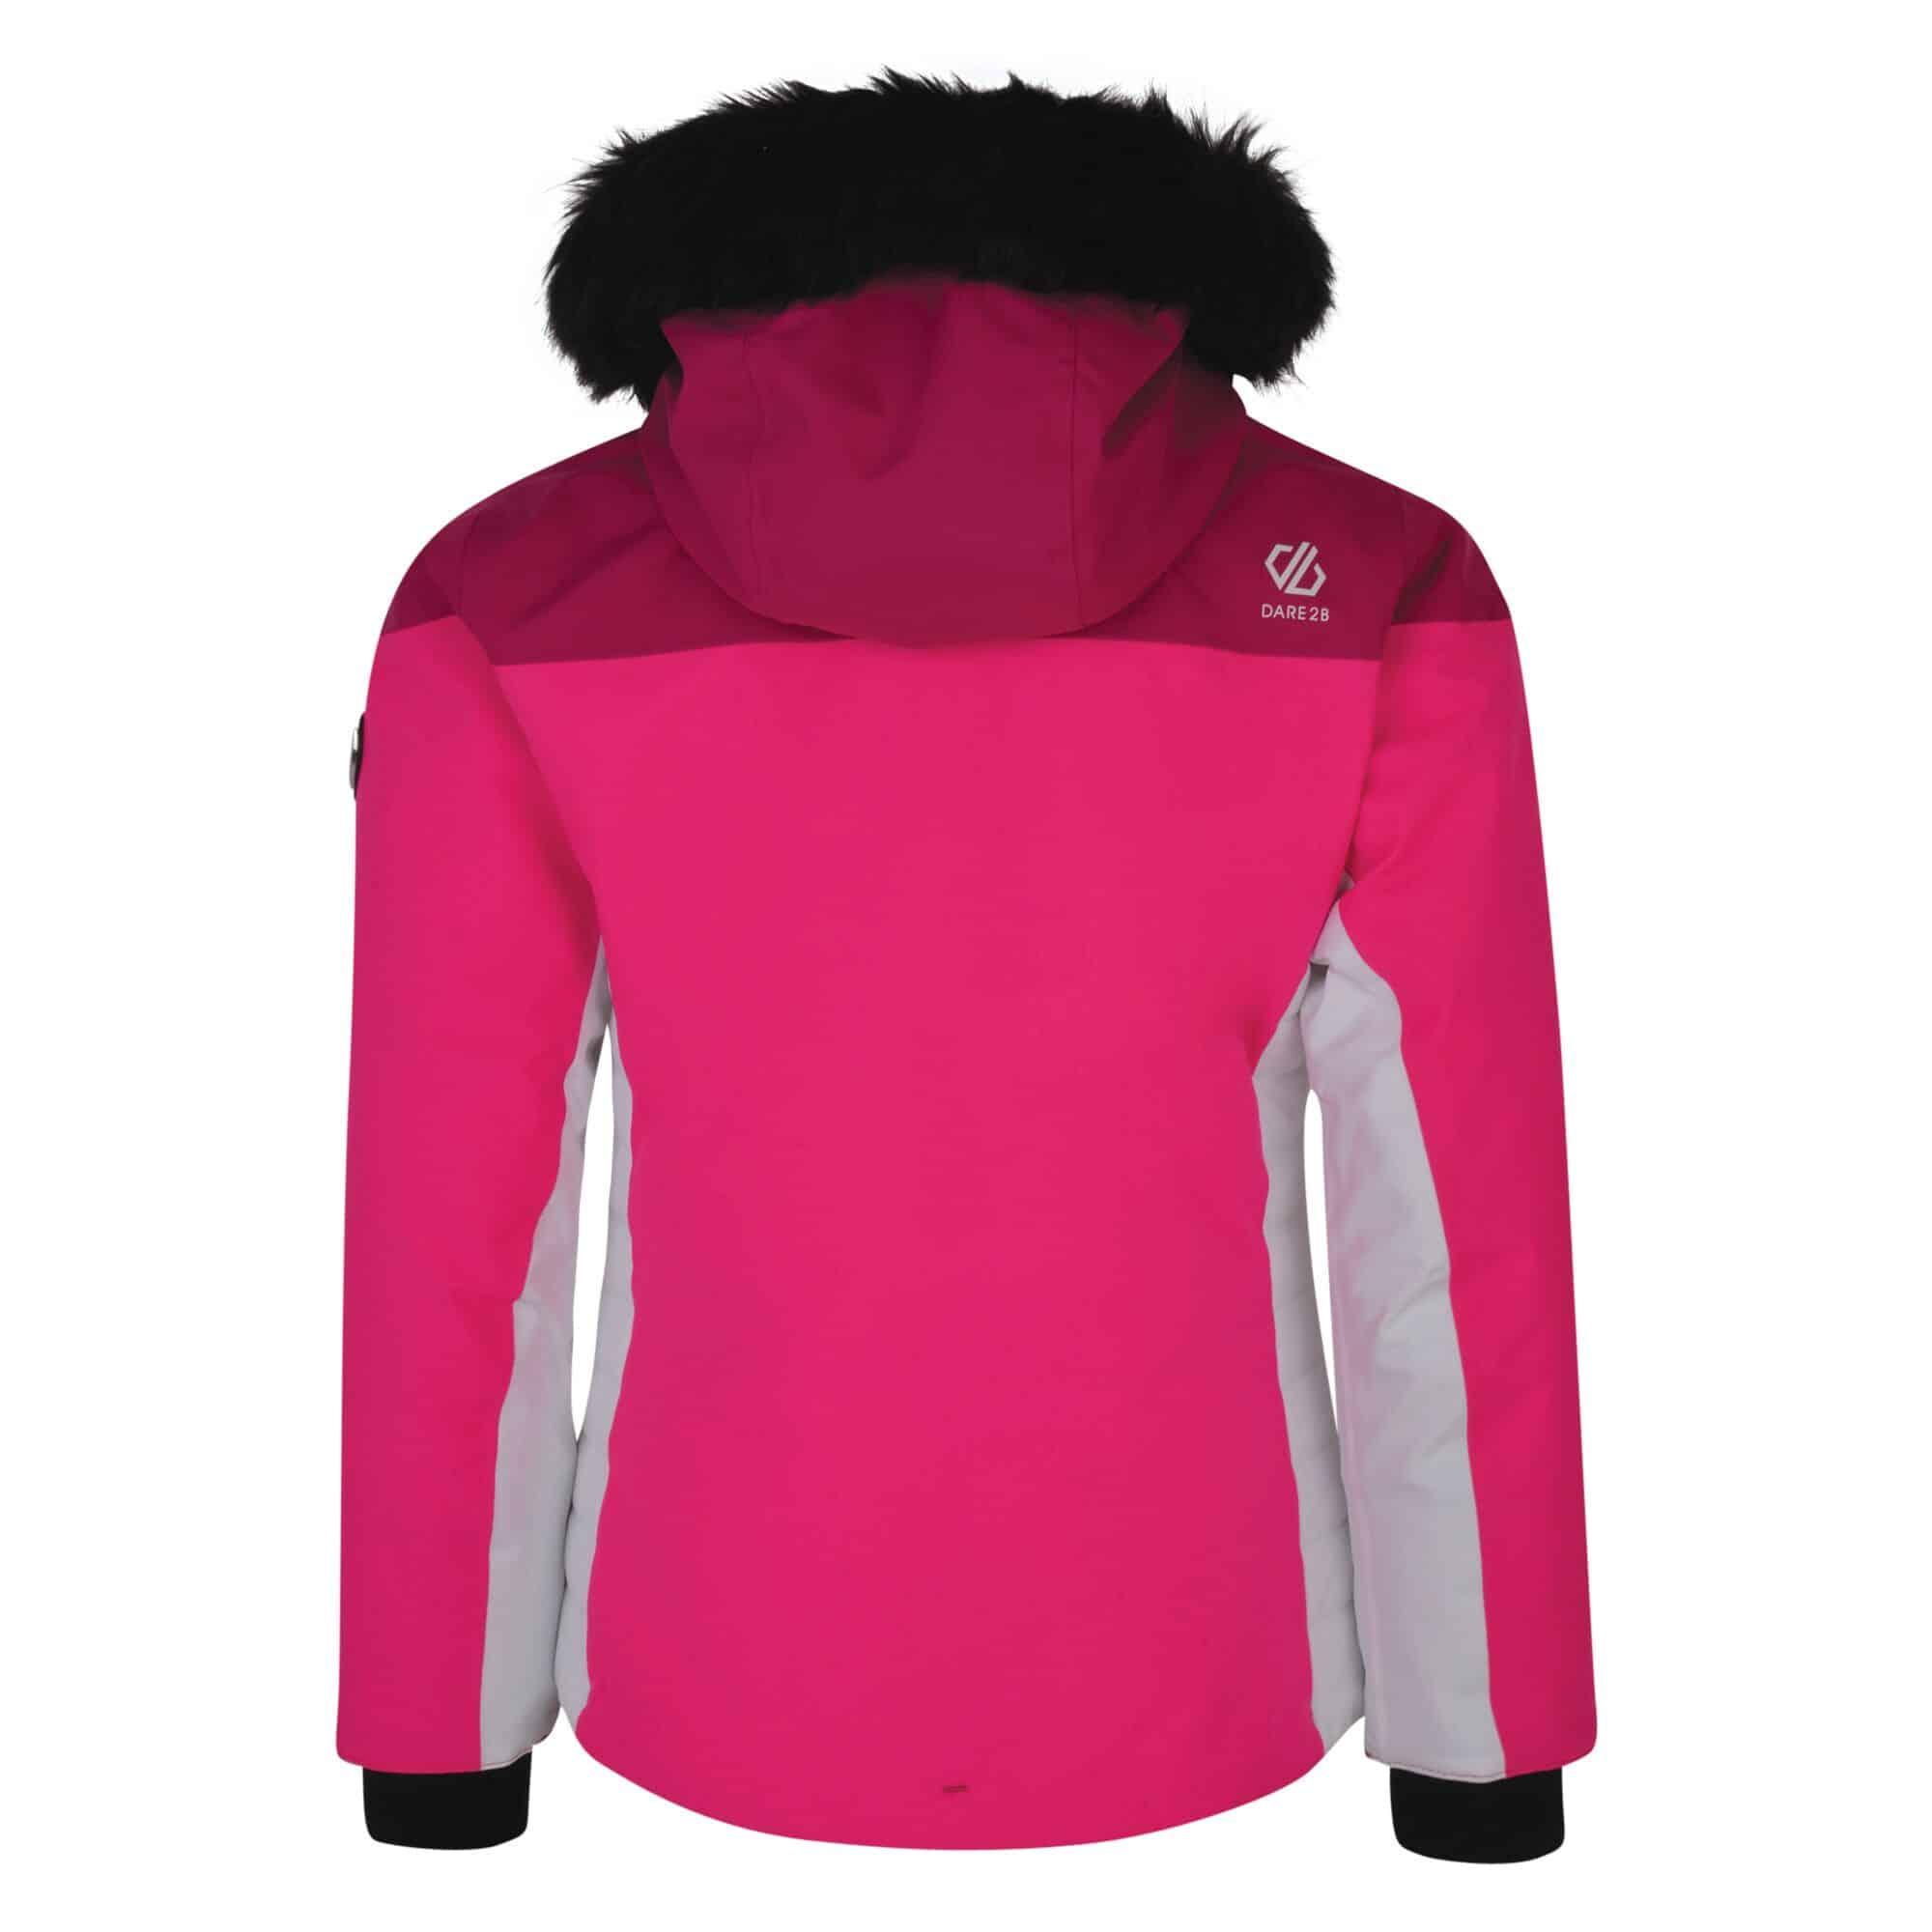 vast pink rear